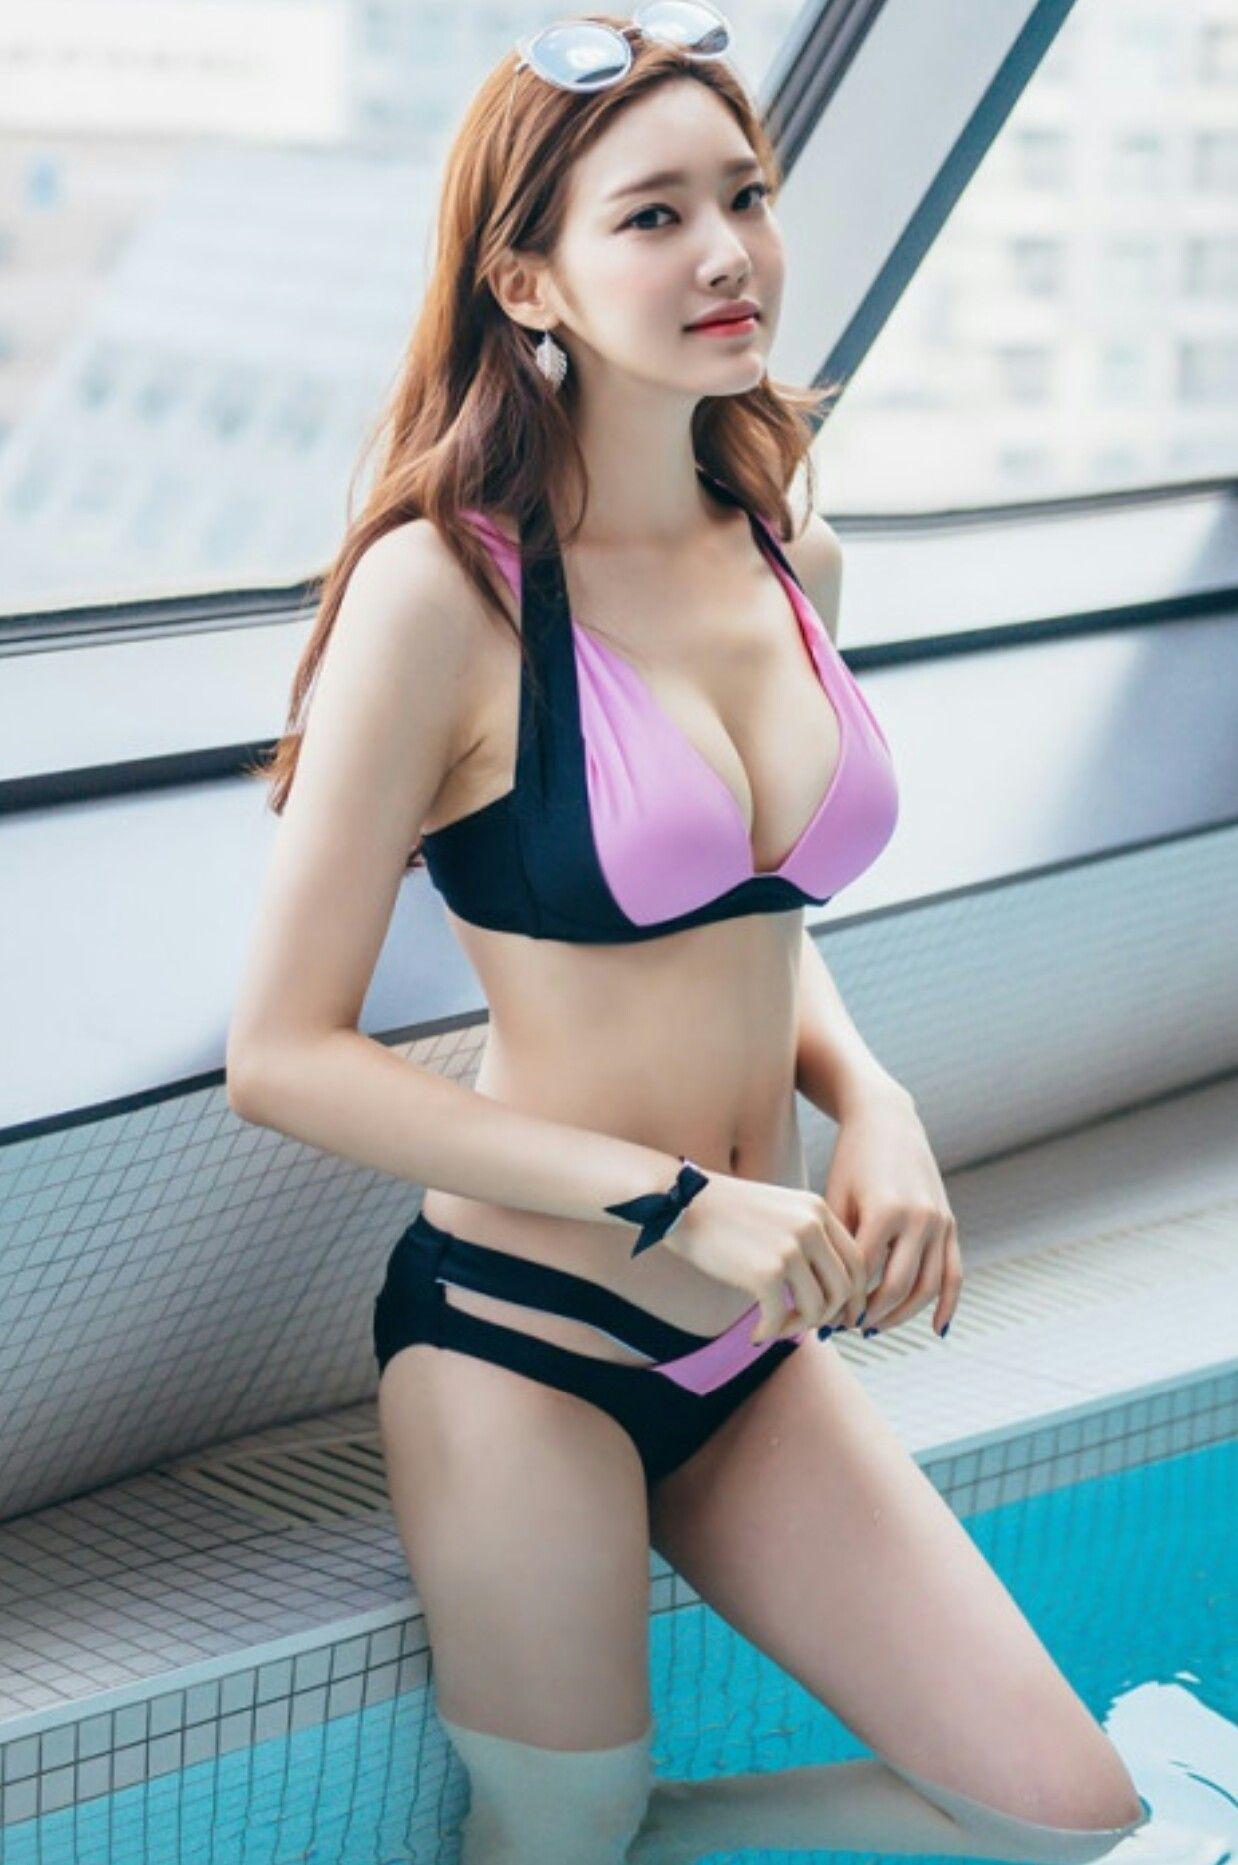 Japanese girl wet spot panties